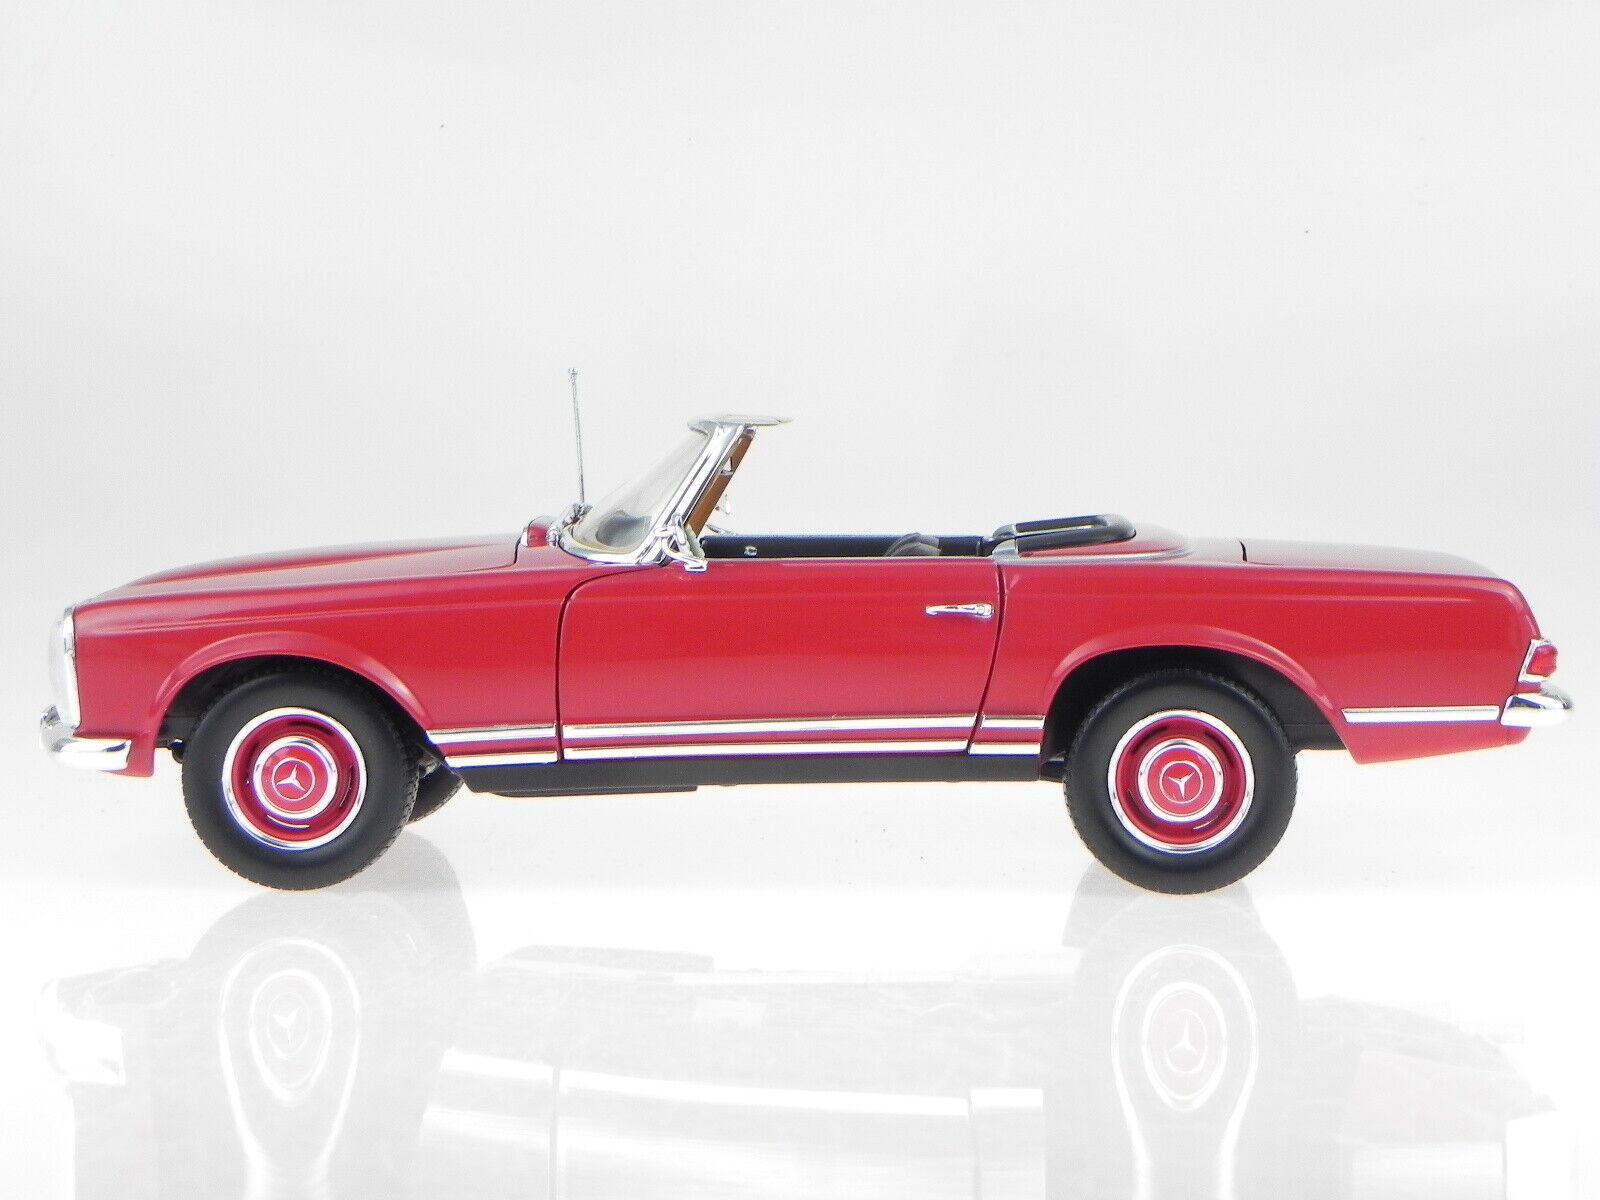 Mercedes Mercedes Mercedes R113 280SL Pagode 1969 dark  red modelcar 183520 Norev 1 18 66f544